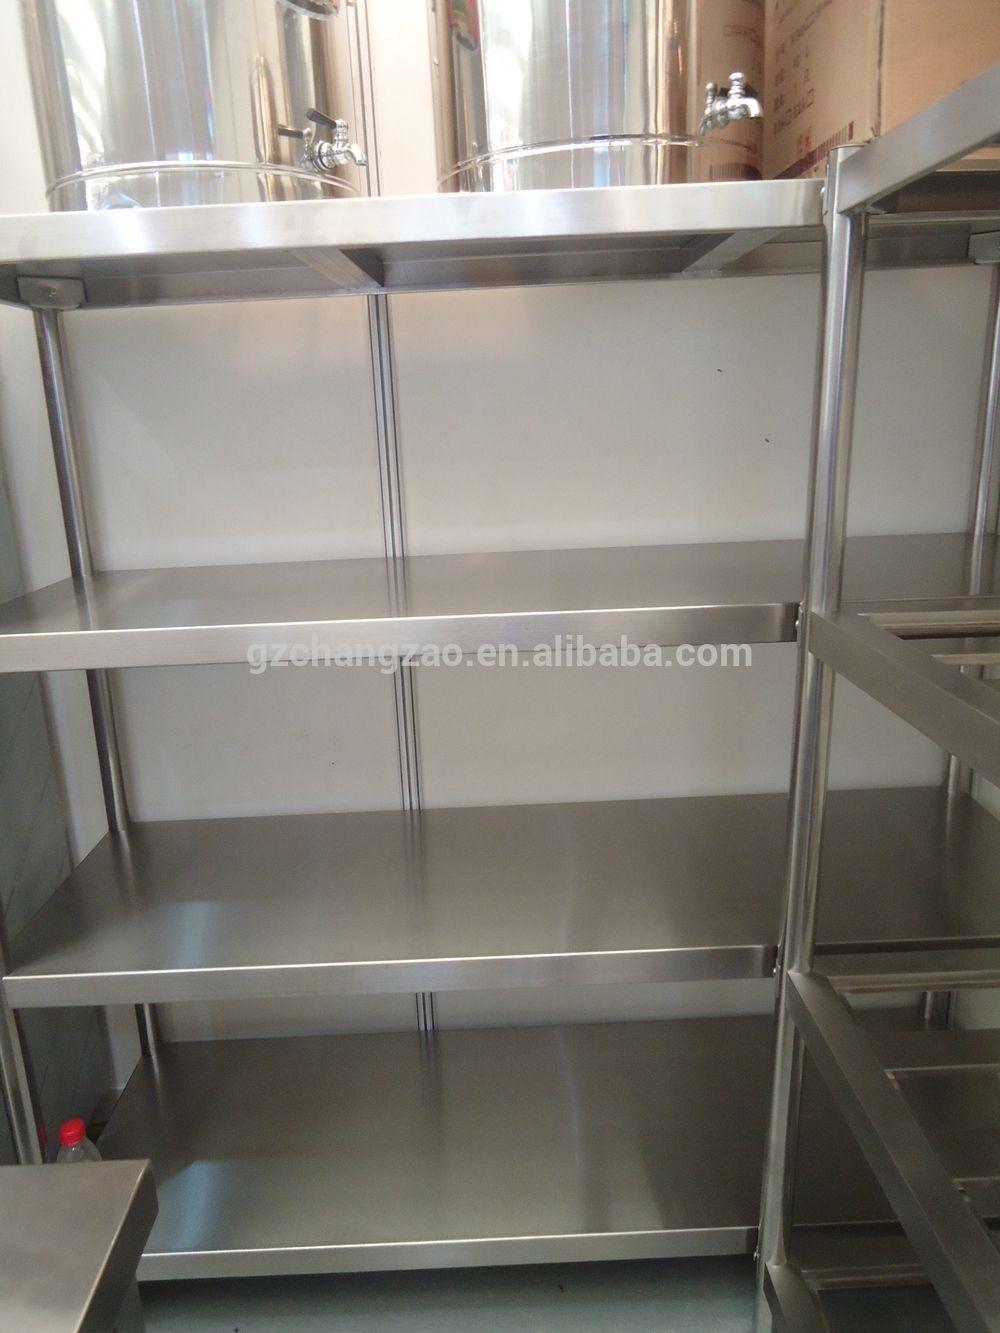 Stainless Steel Storage Rack Board Type Stainless Steel Free